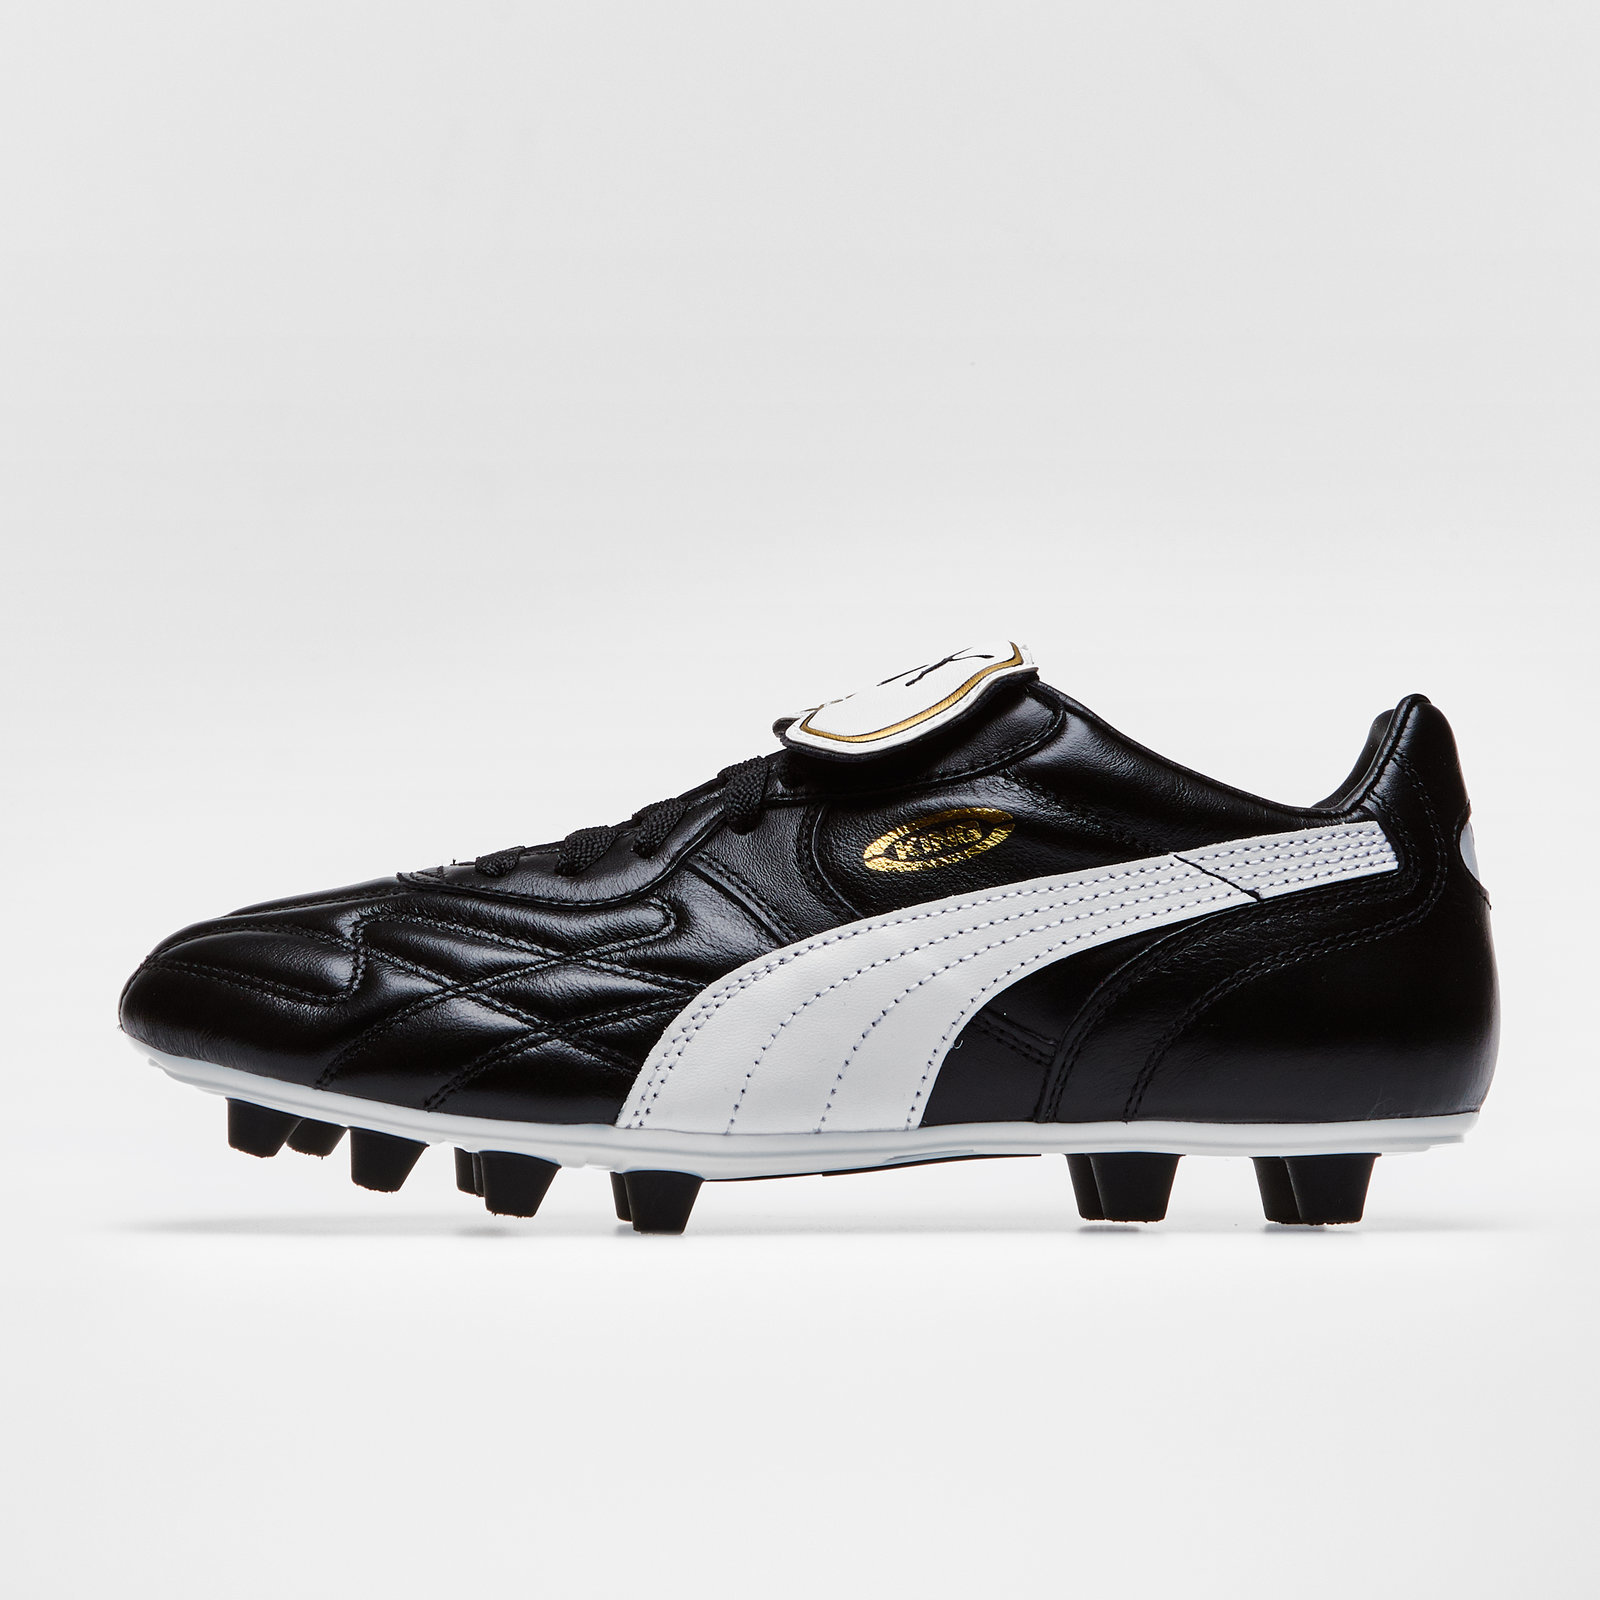 Football King Top Classic FG Football Boots